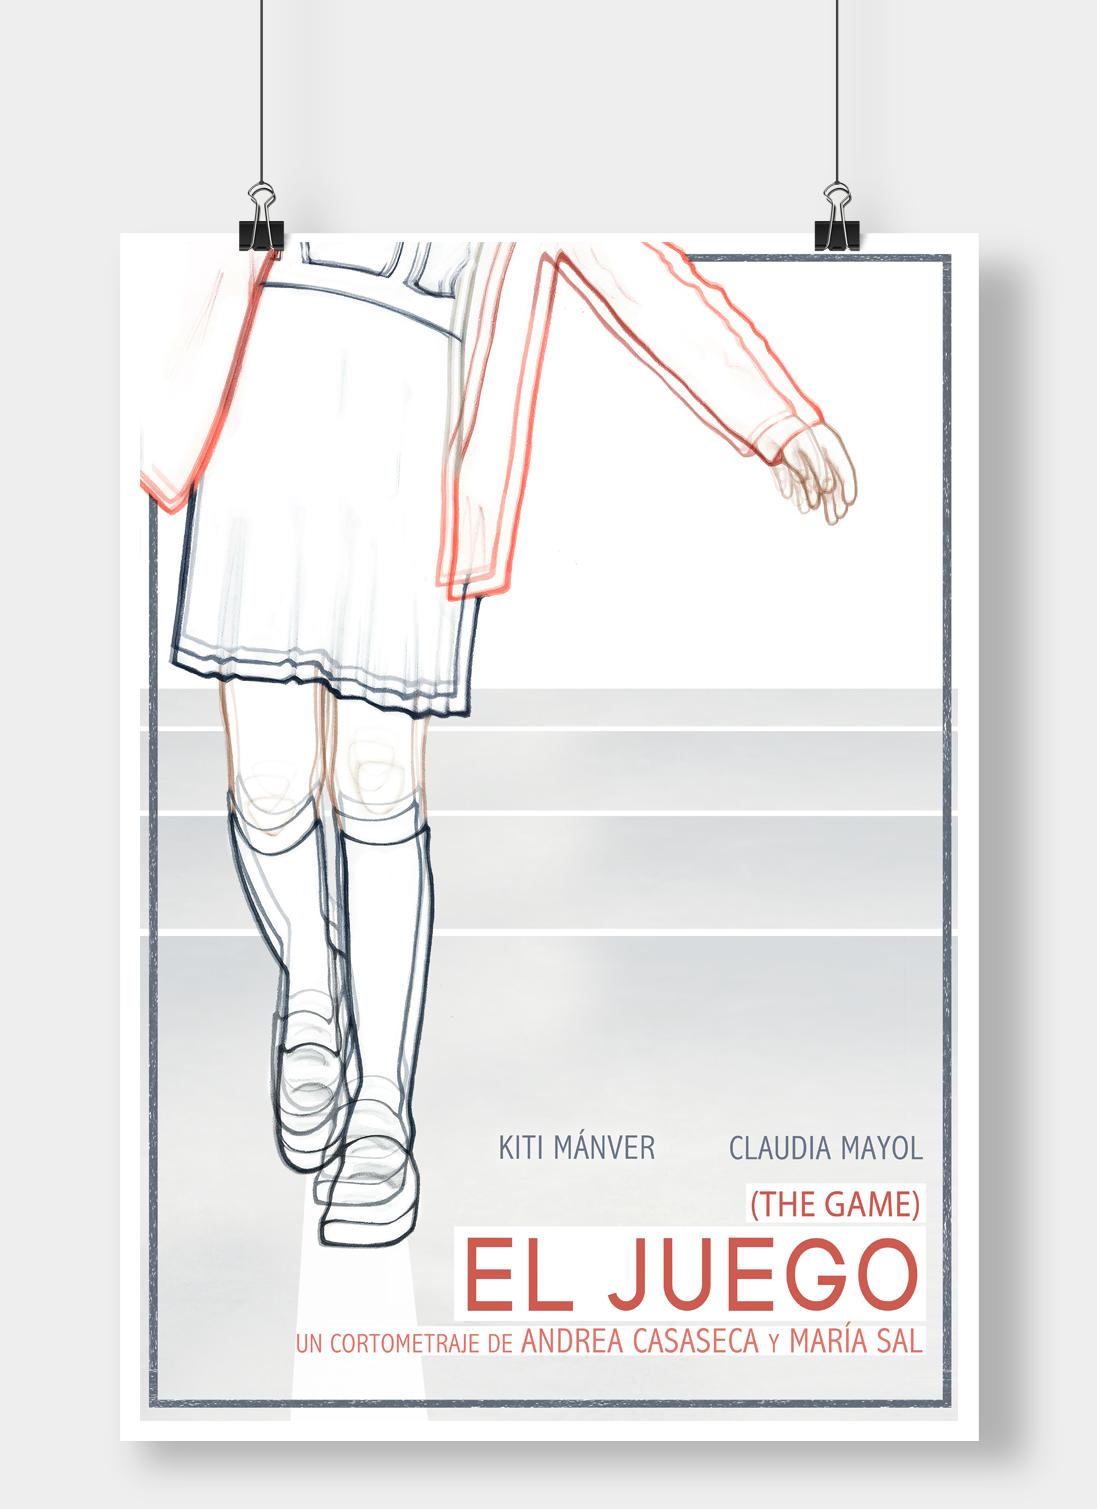 Eljuego-cartel